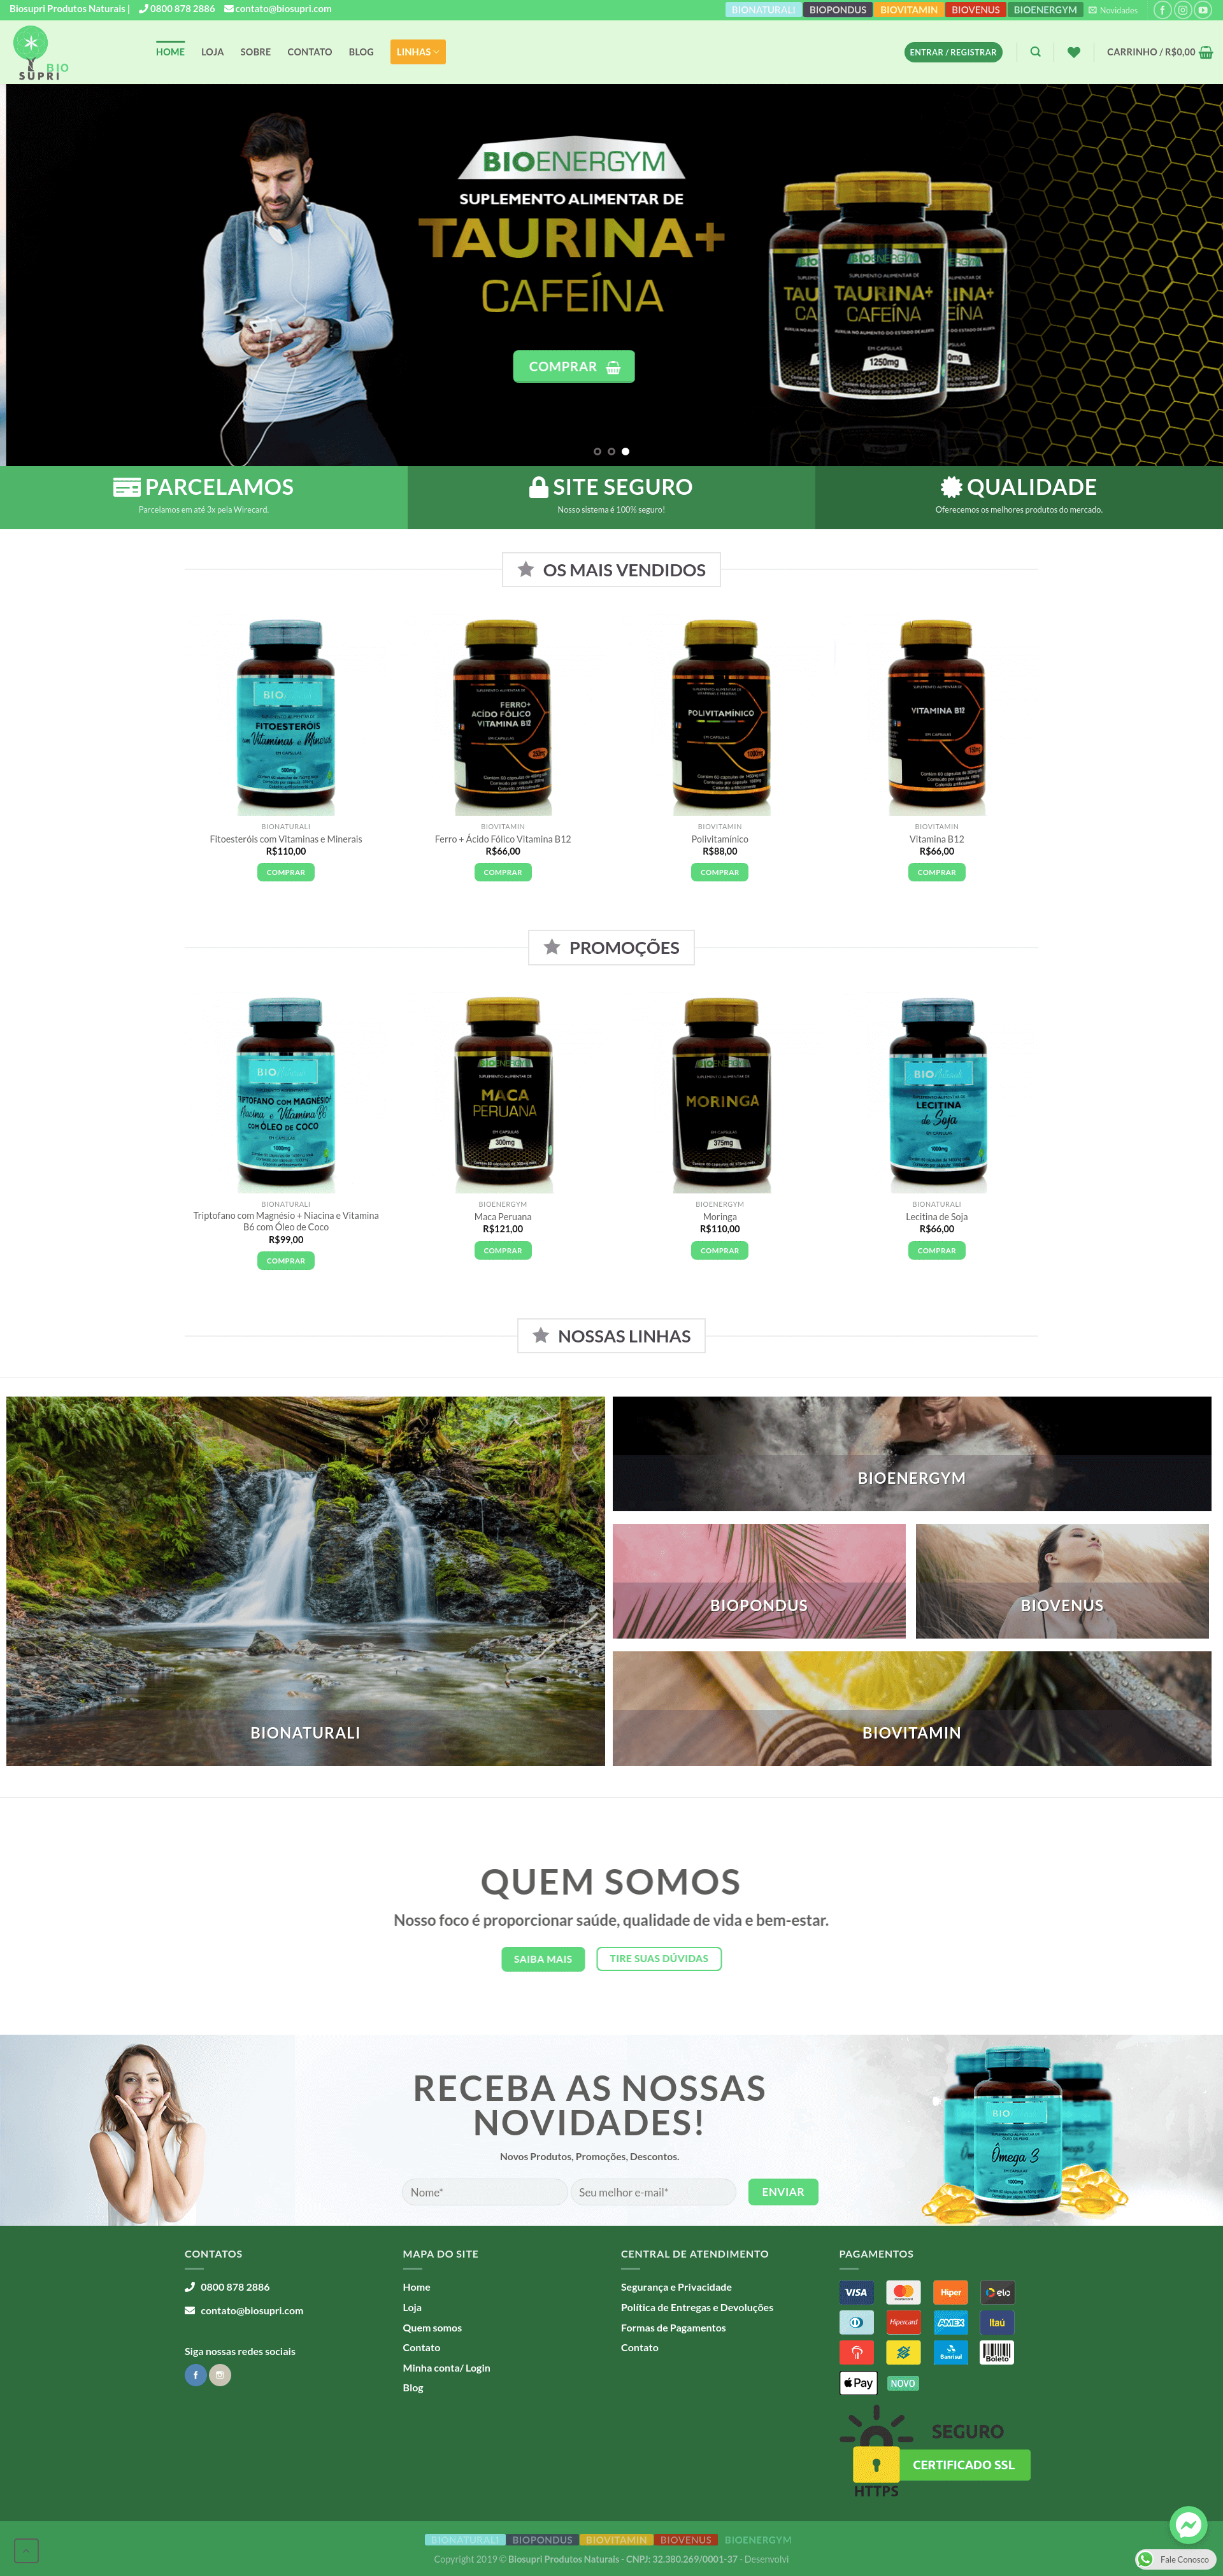 BioSupri Produtos Naturais E-commerce Taurina Cafeína